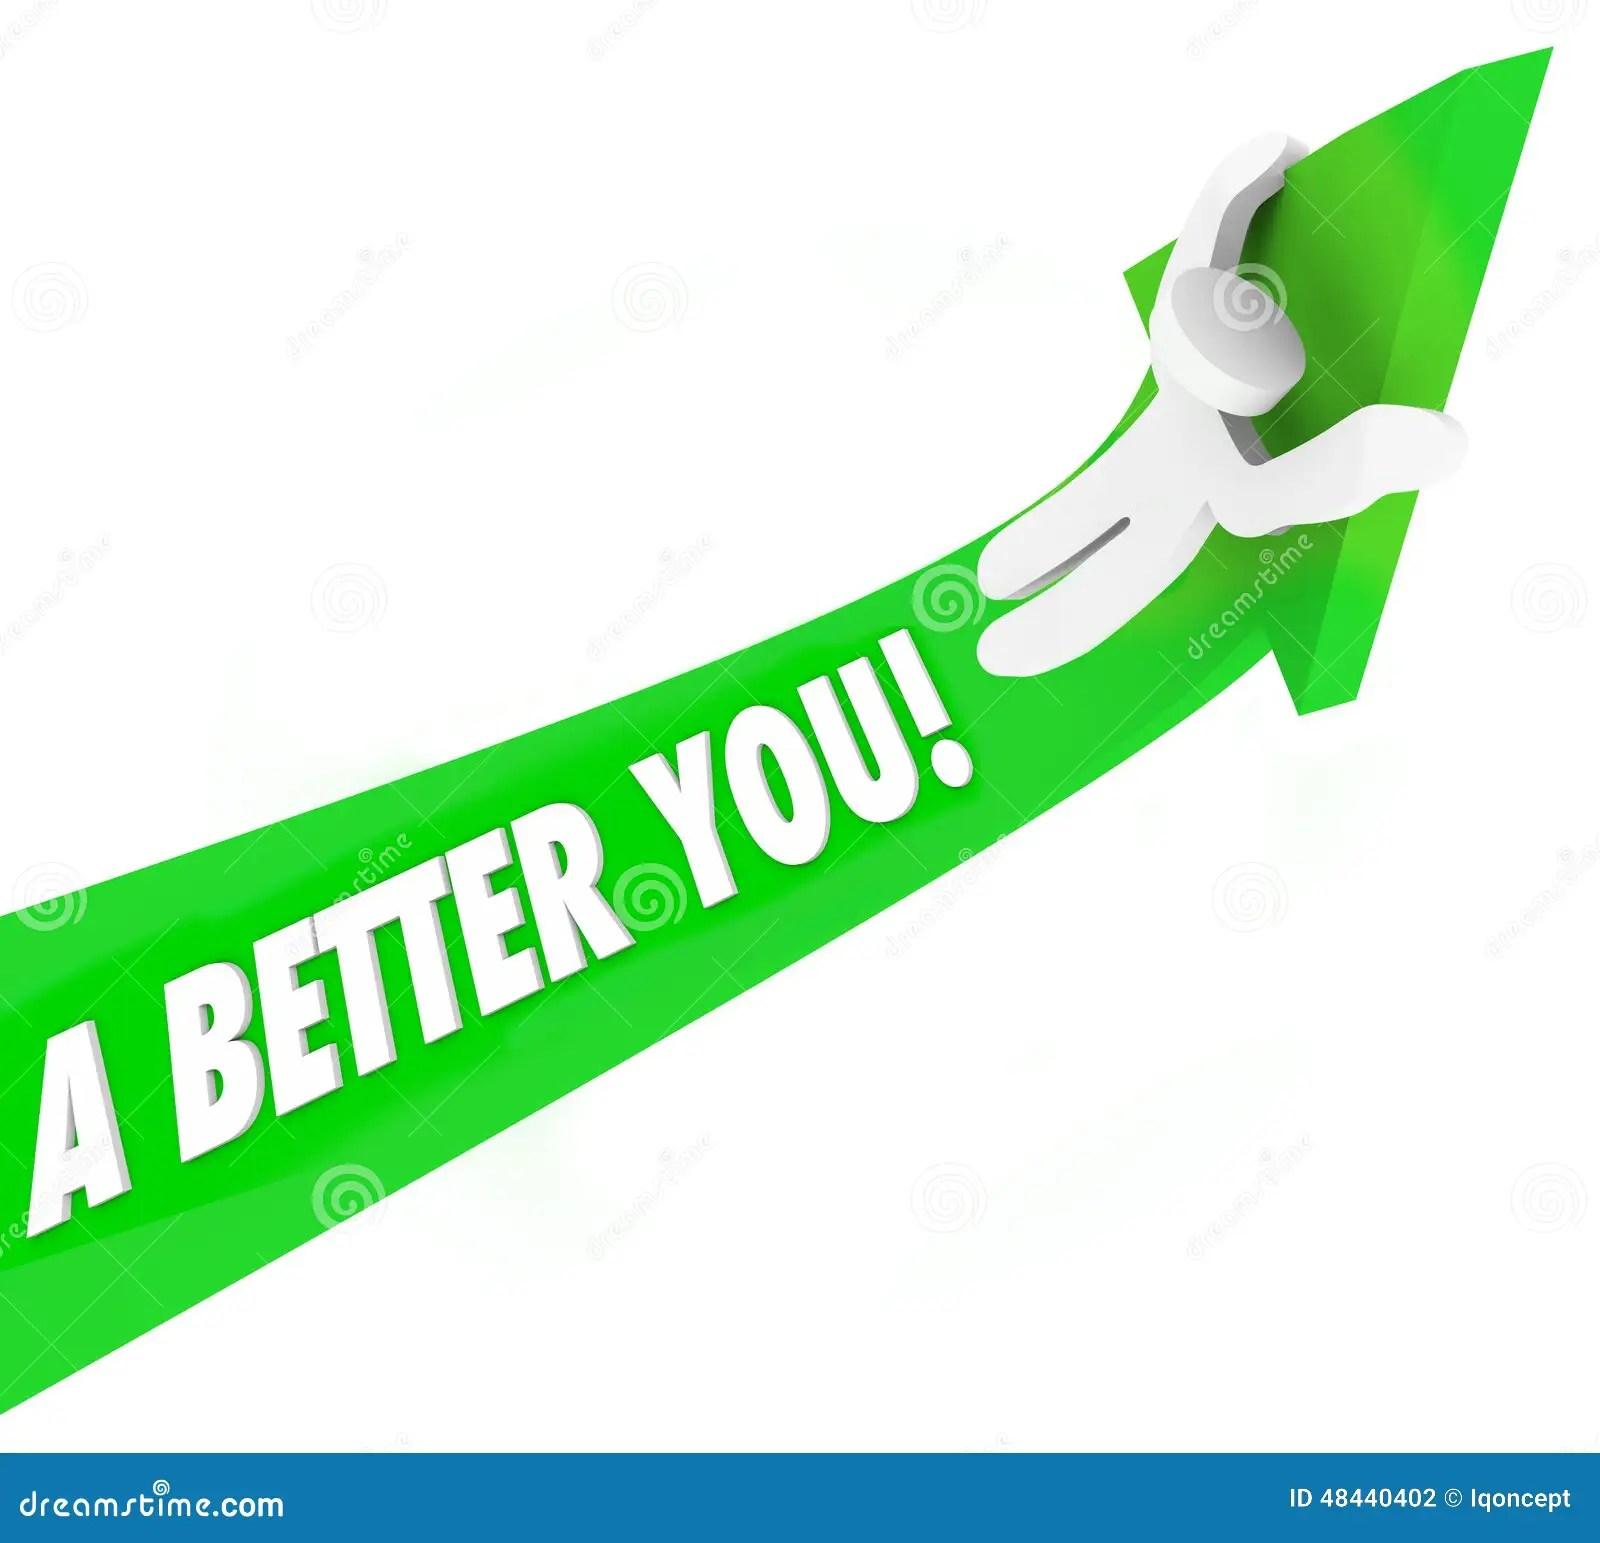 Best Mens Self Improvement Blogs